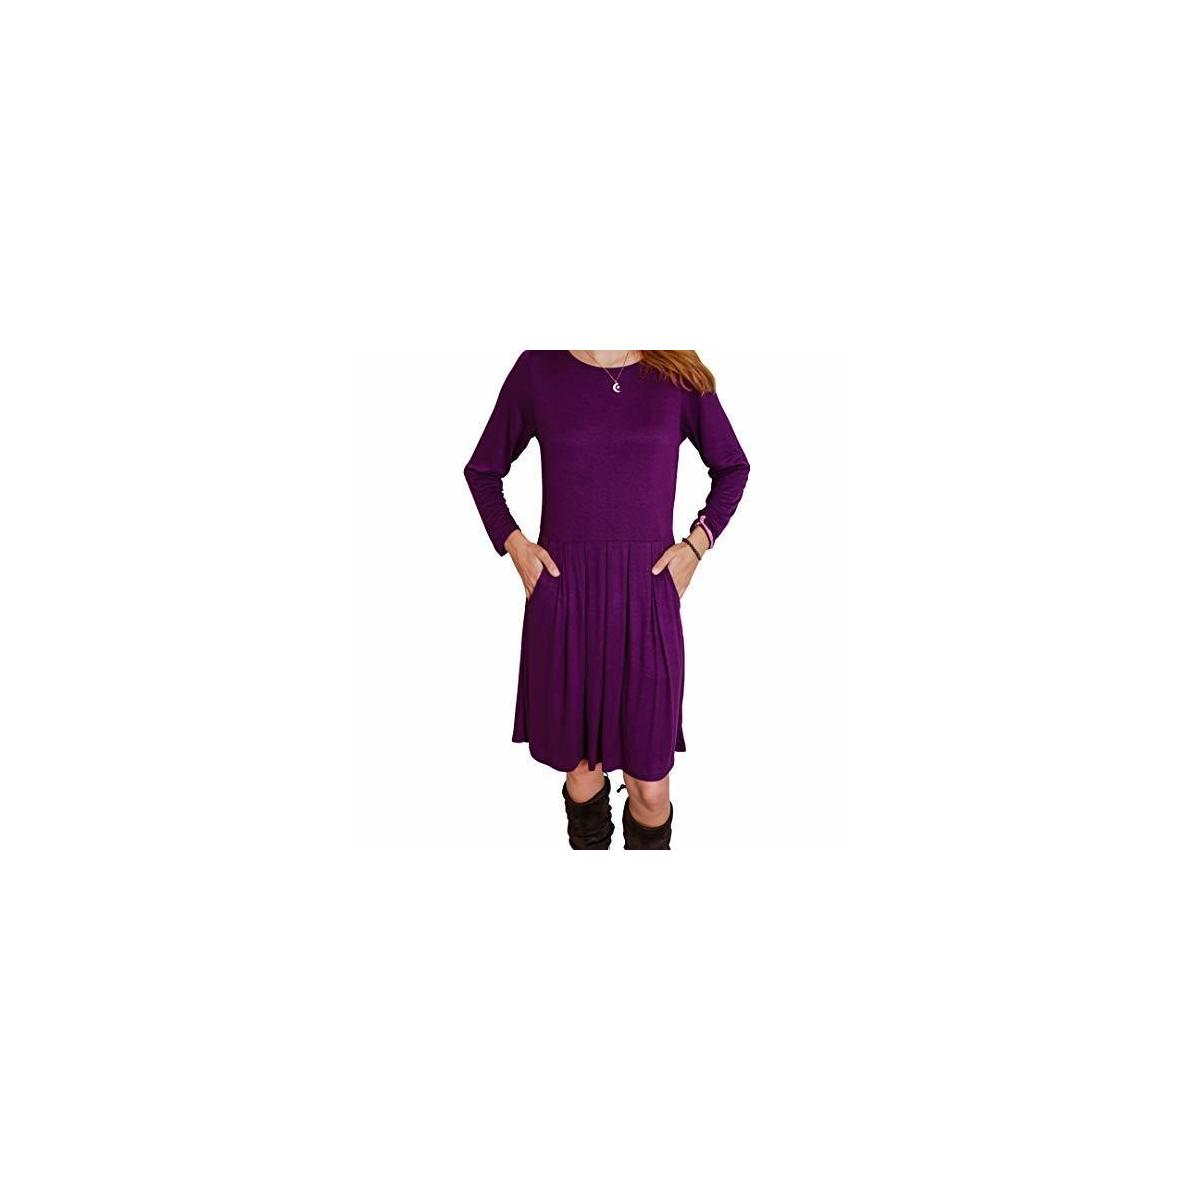 Happy Trunks Women's T-shirt Dress Long Sleeve Pleated Loose